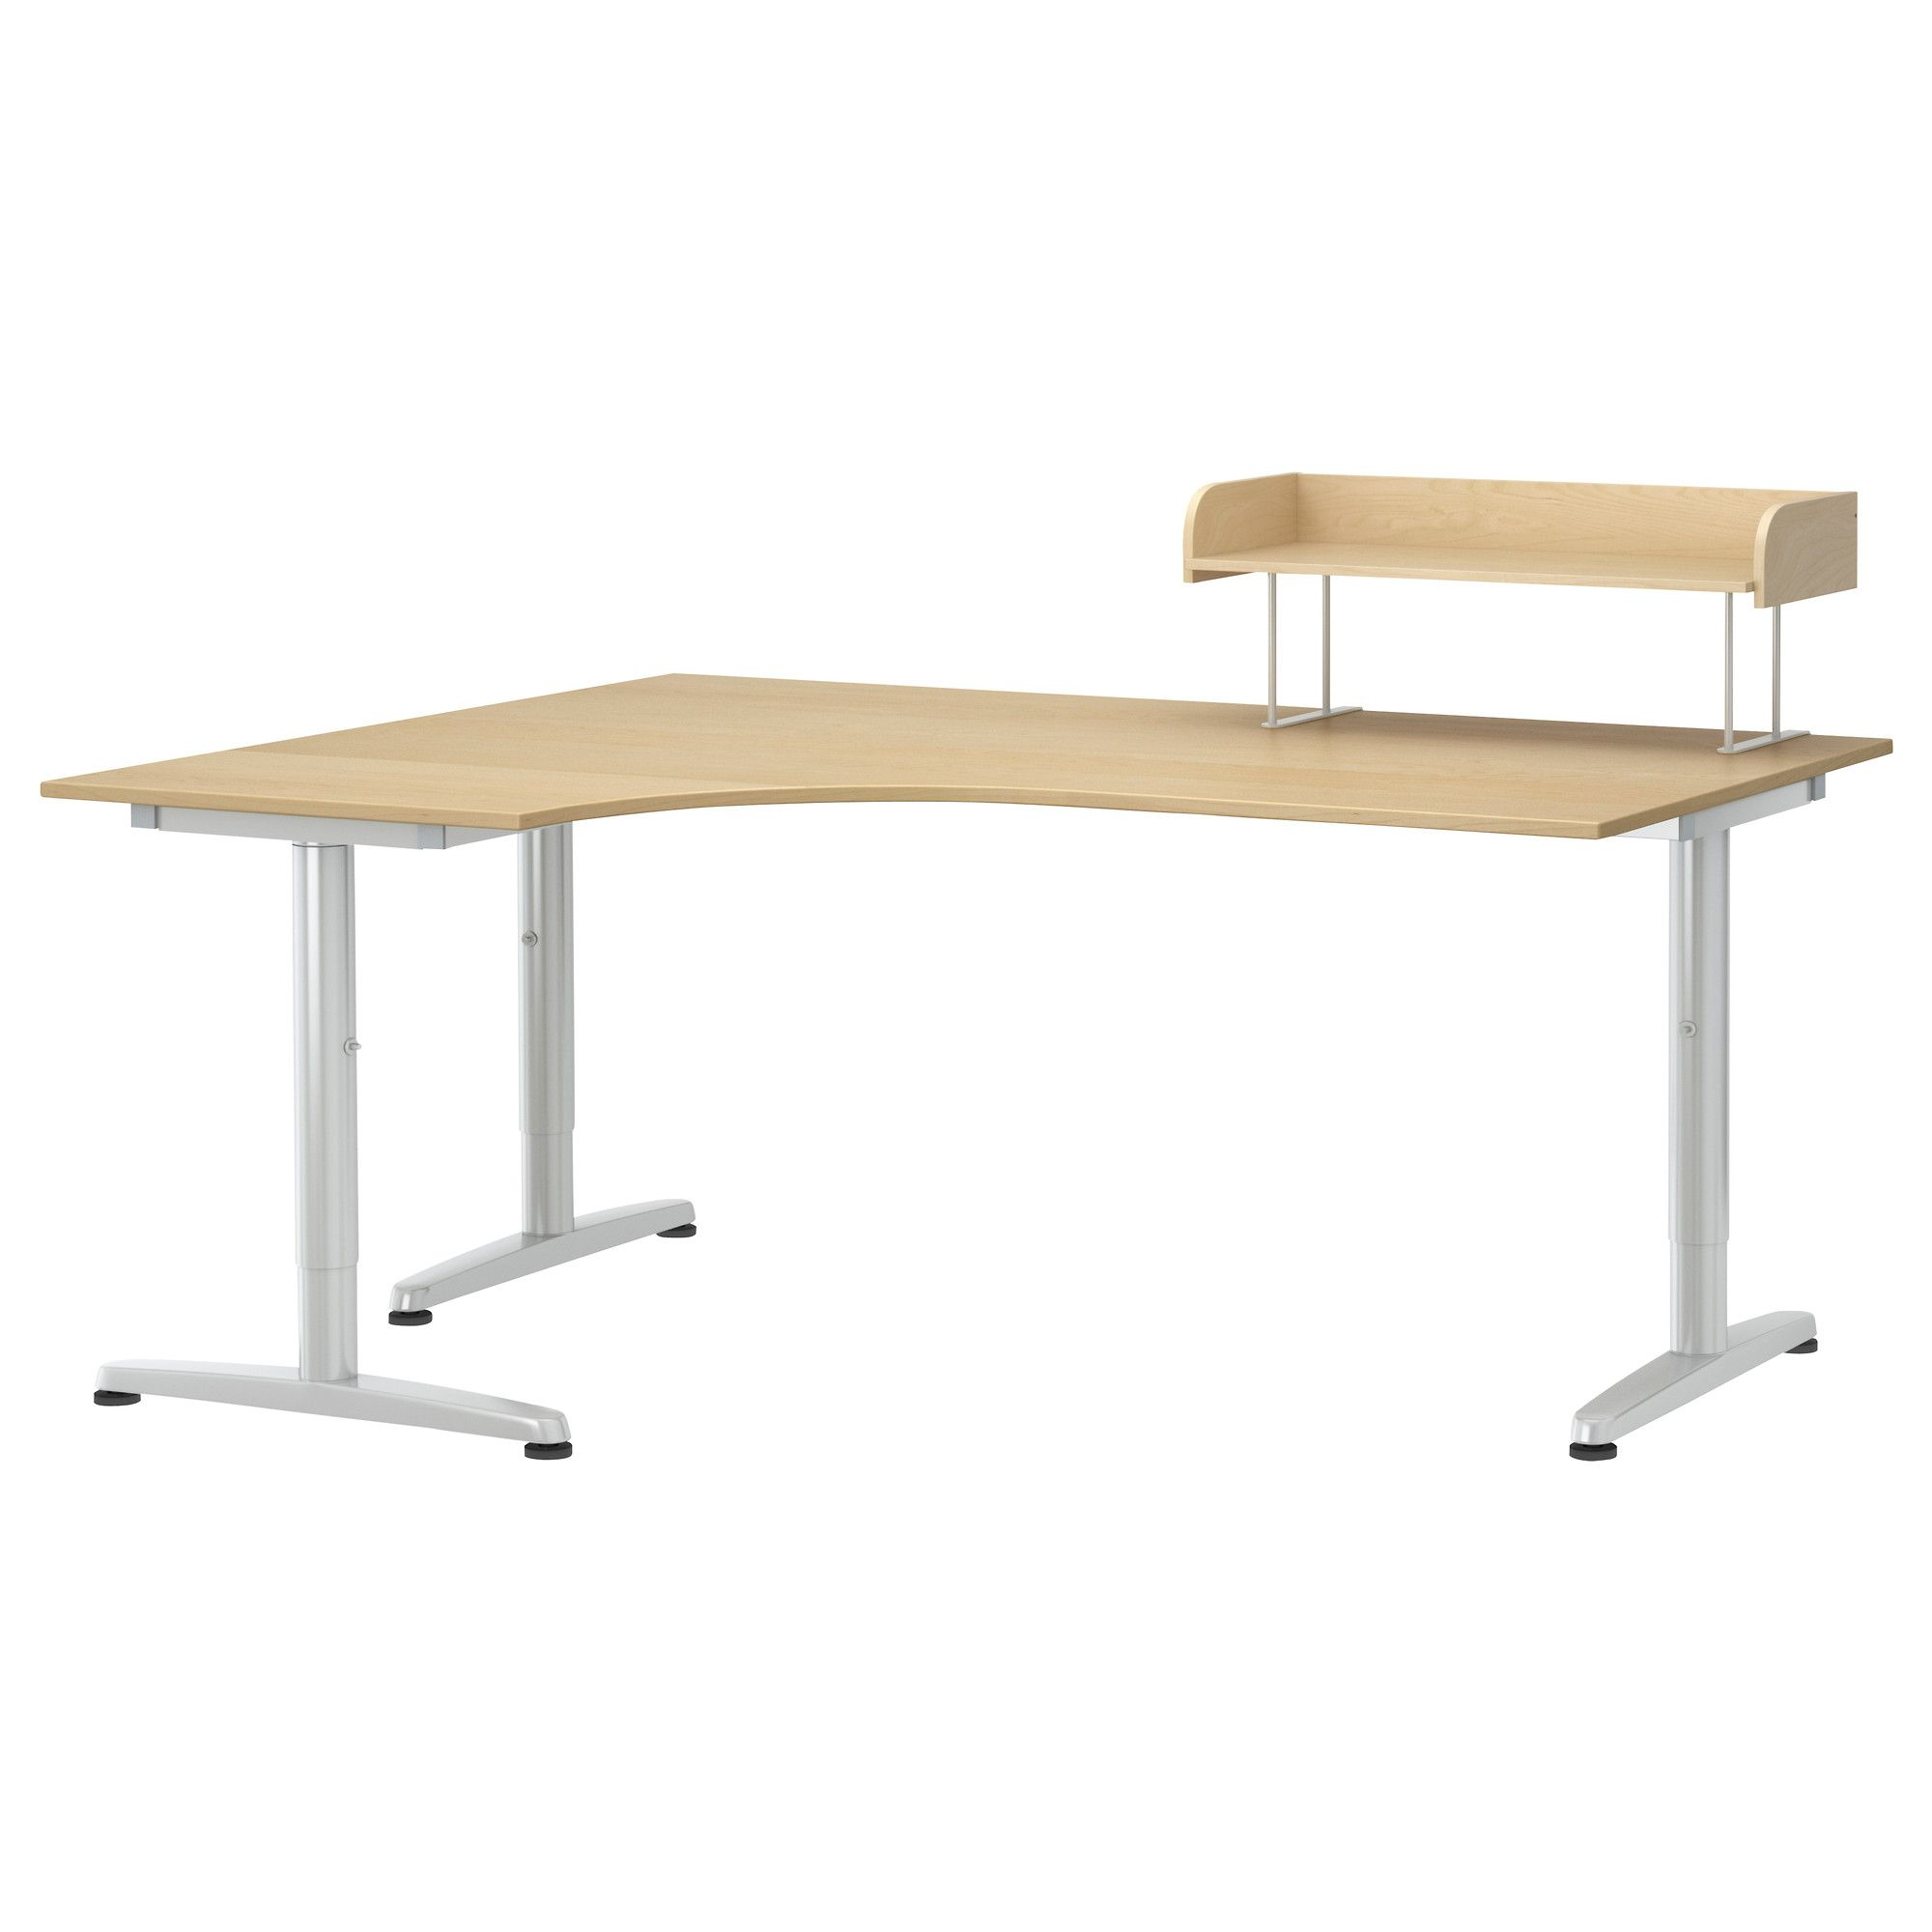 Corner Desk Using Ikea Galant Top And Alex Drawer Units By Bertha Home Office Design Ikea Corner Desk Ikea Galant